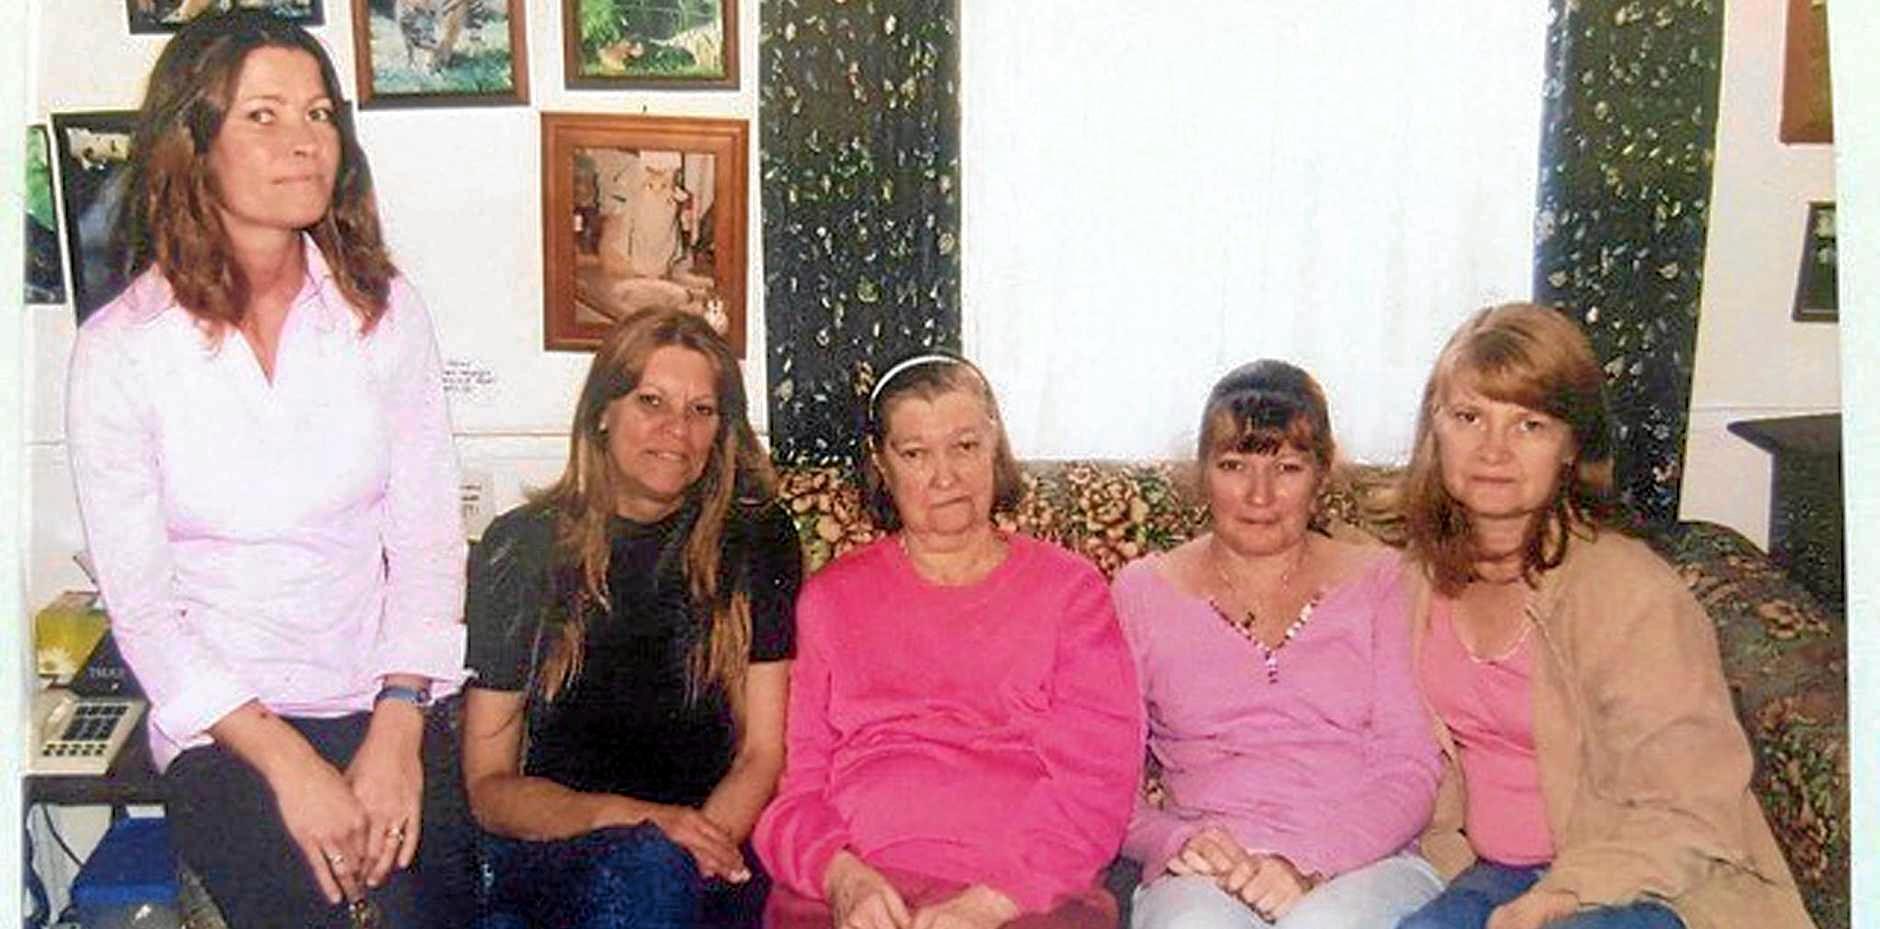 ELLEN WILSON'S FAMILY: (From left) Sisters Fiona Browne, Charlotte Gibson, Mum Sylvia Wilson, Ellen Wilson and Elizabeth Crook.